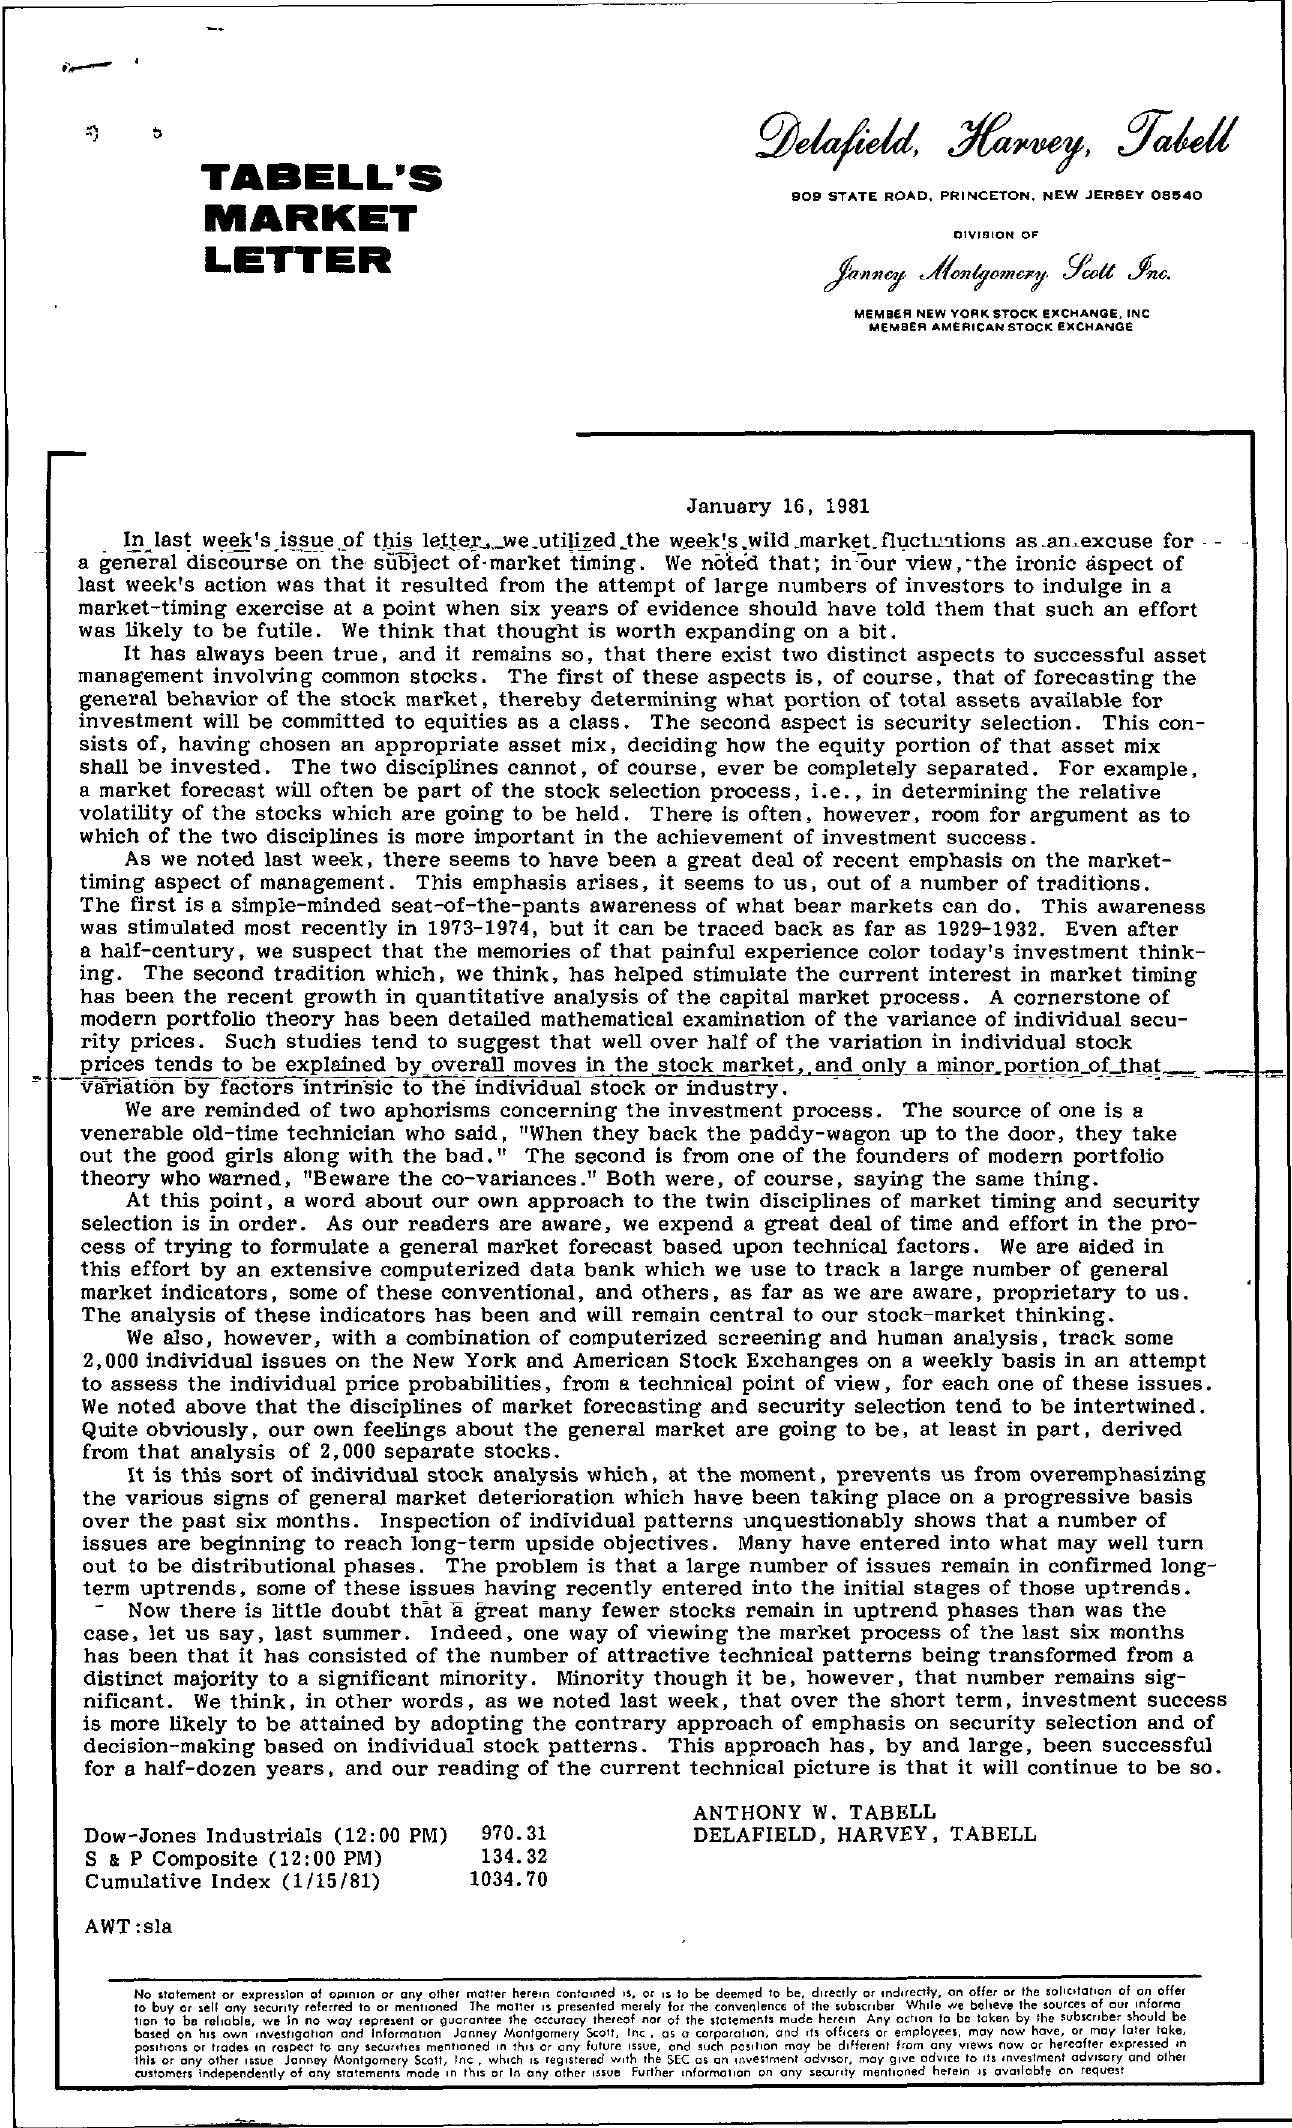 Tabell's Market Letter - January 16, 1981